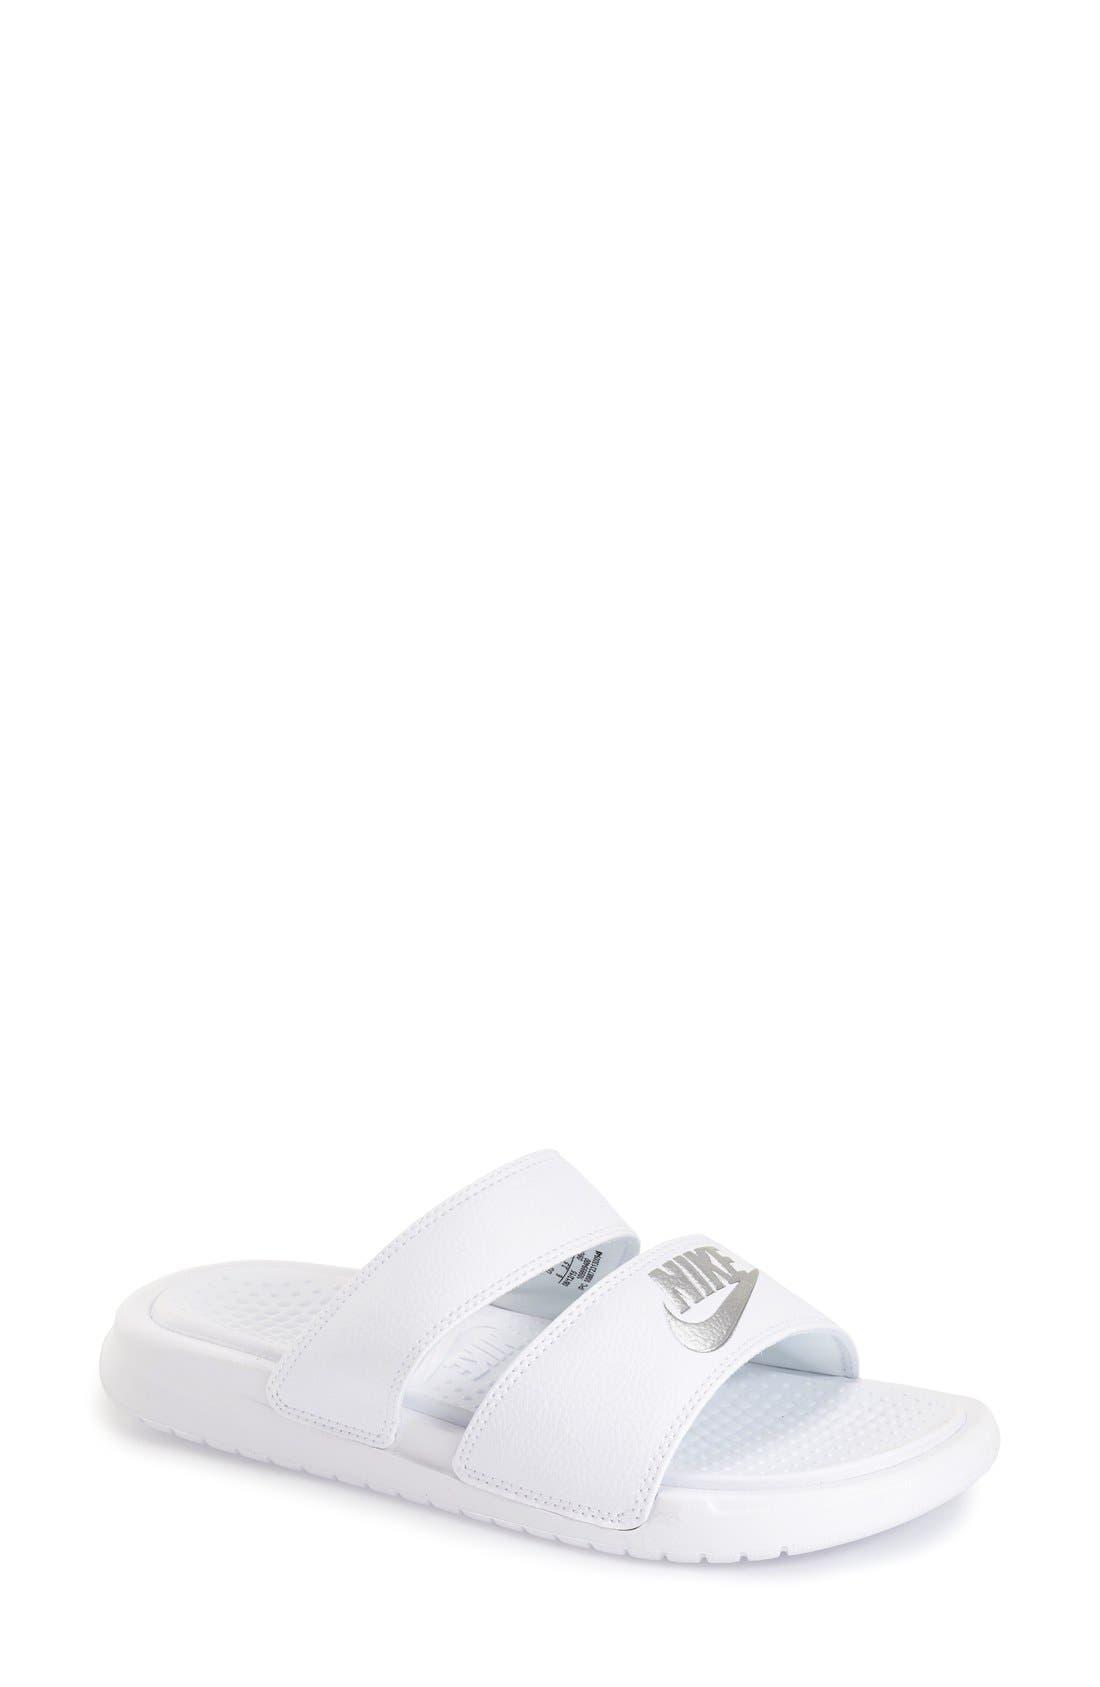 'Benassi - Ultra' Slide Sandal,                             Main thumbnail 1, color,                             White/ Metallic Silver